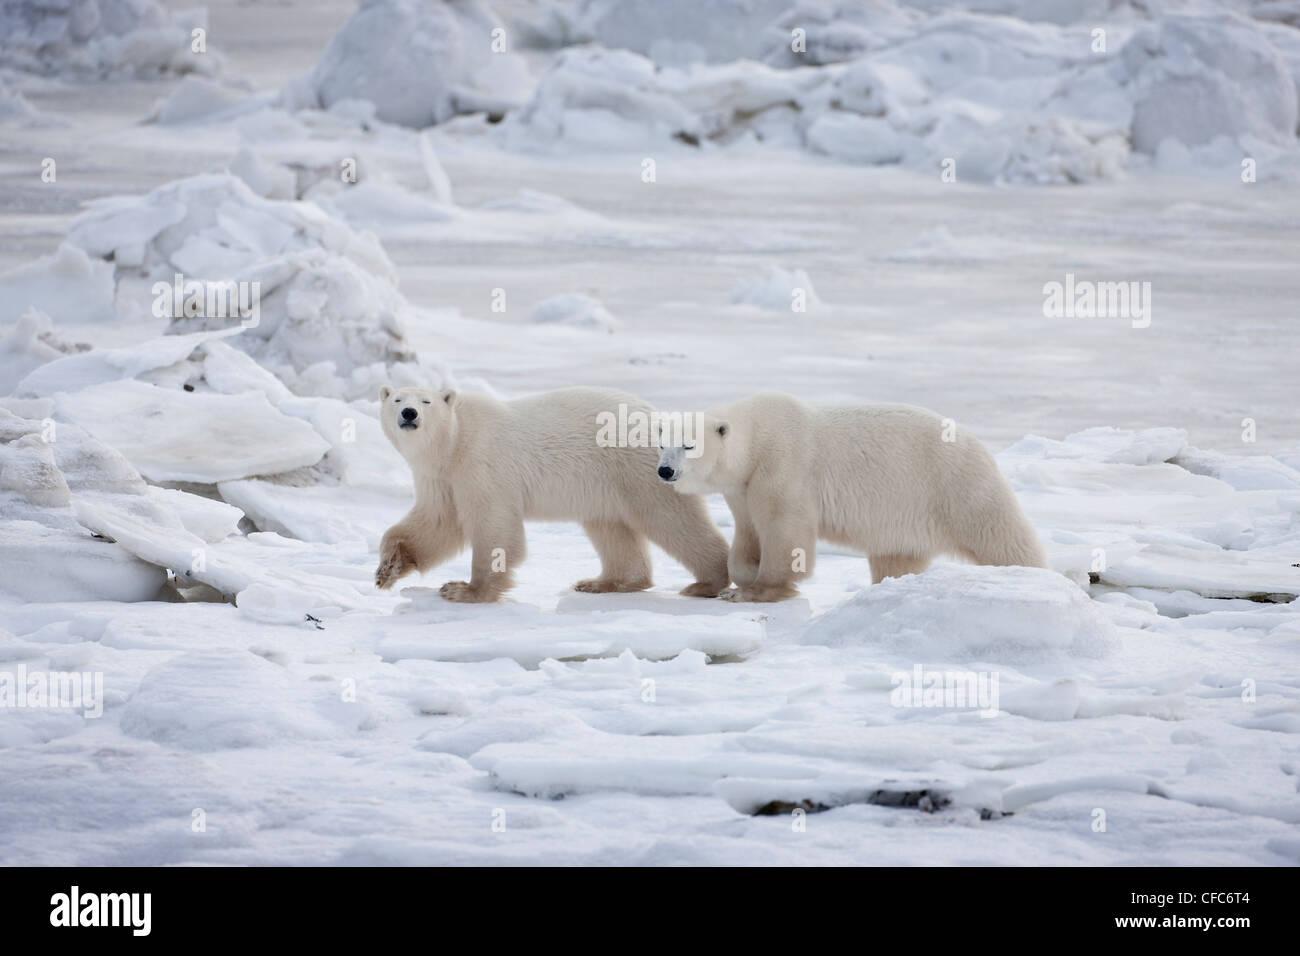 Polar Bears Ursus maritimus adult last year's cub - Stock Image